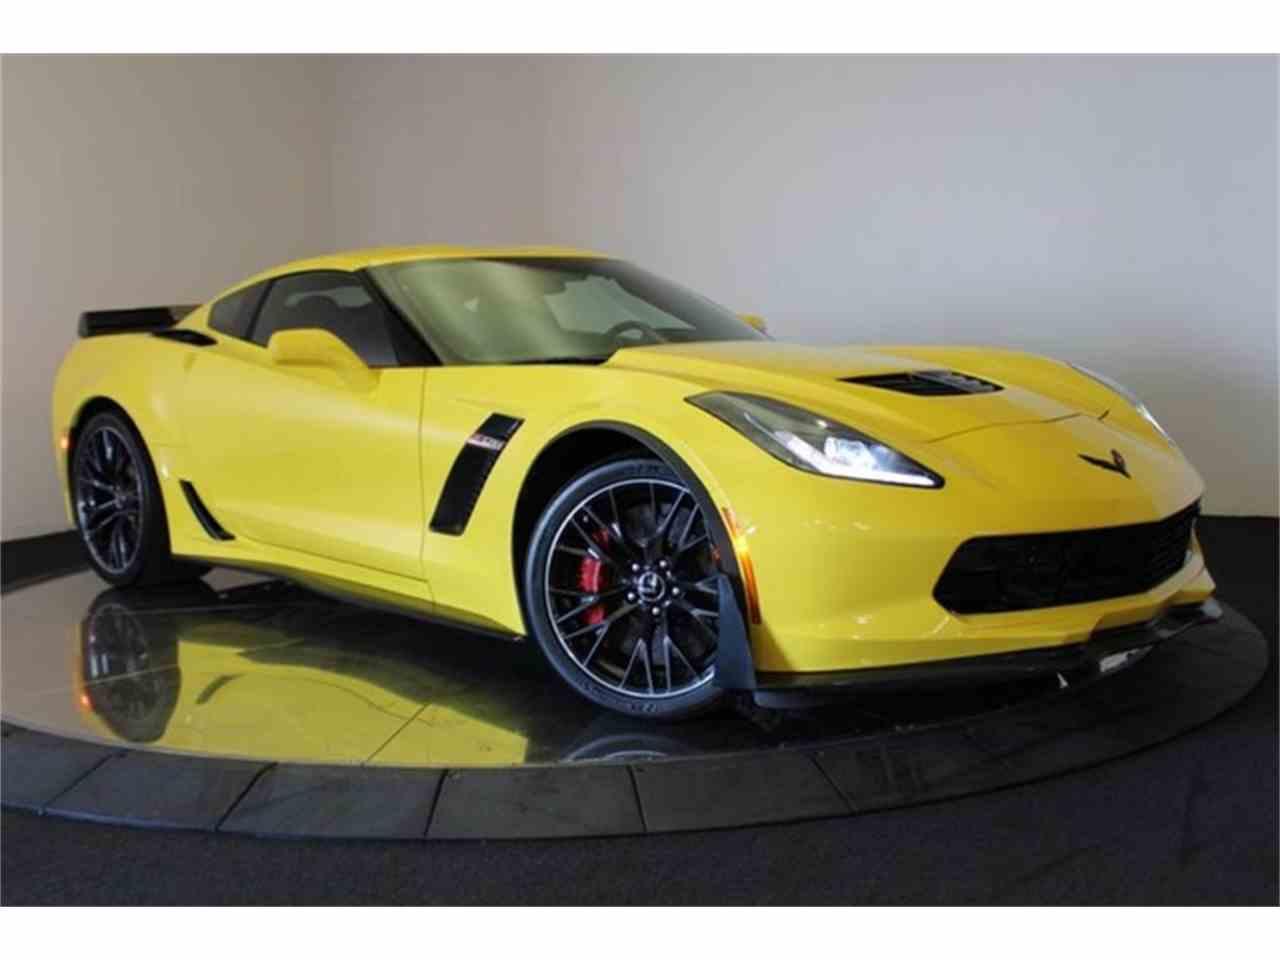 Corvette chevy corvette 2016 : 2016 Chevrolet Corvette for Sale | ClassicCars.com | CC-1015927